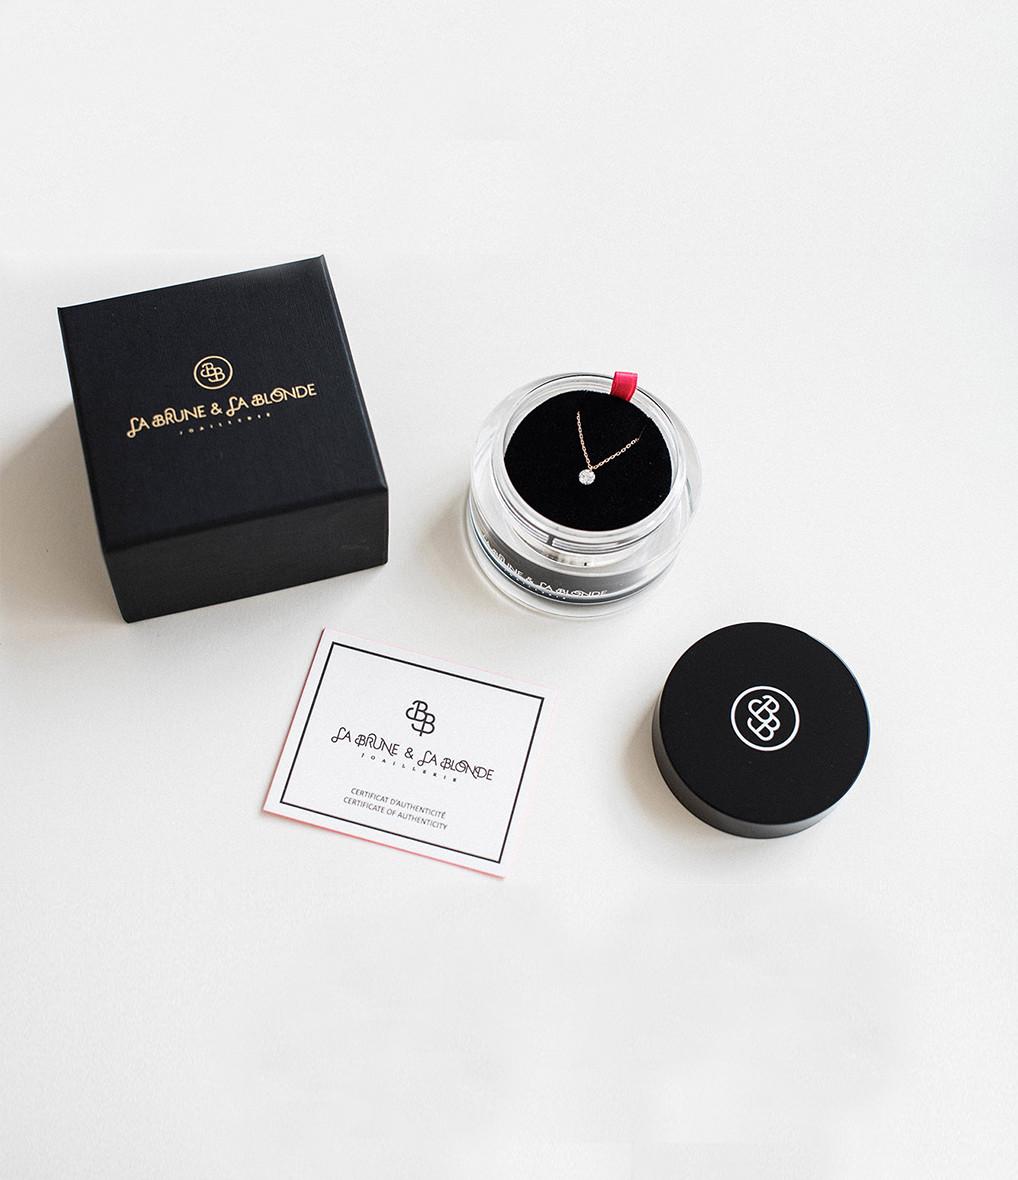 LA BRUNE & LA BLONDE - Collier Excentrique Diamant Brillant Or Blanc